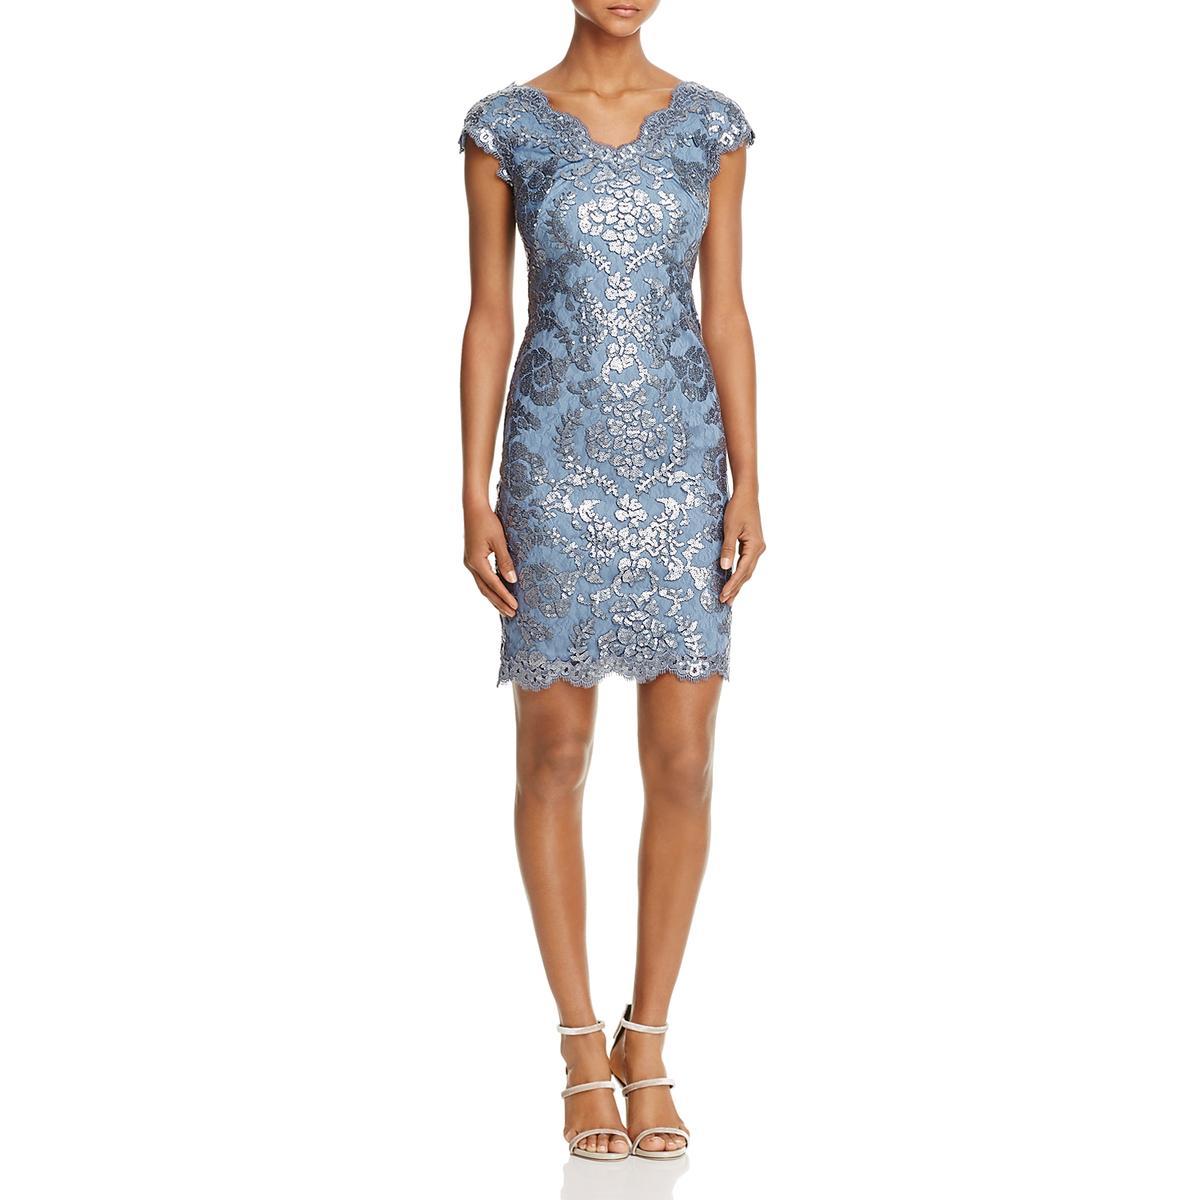 555b73832c77 Details about Tadashi Shoji Womens Blue Lace Overlay Cocktail Dress Petites  10P BHFO 2982